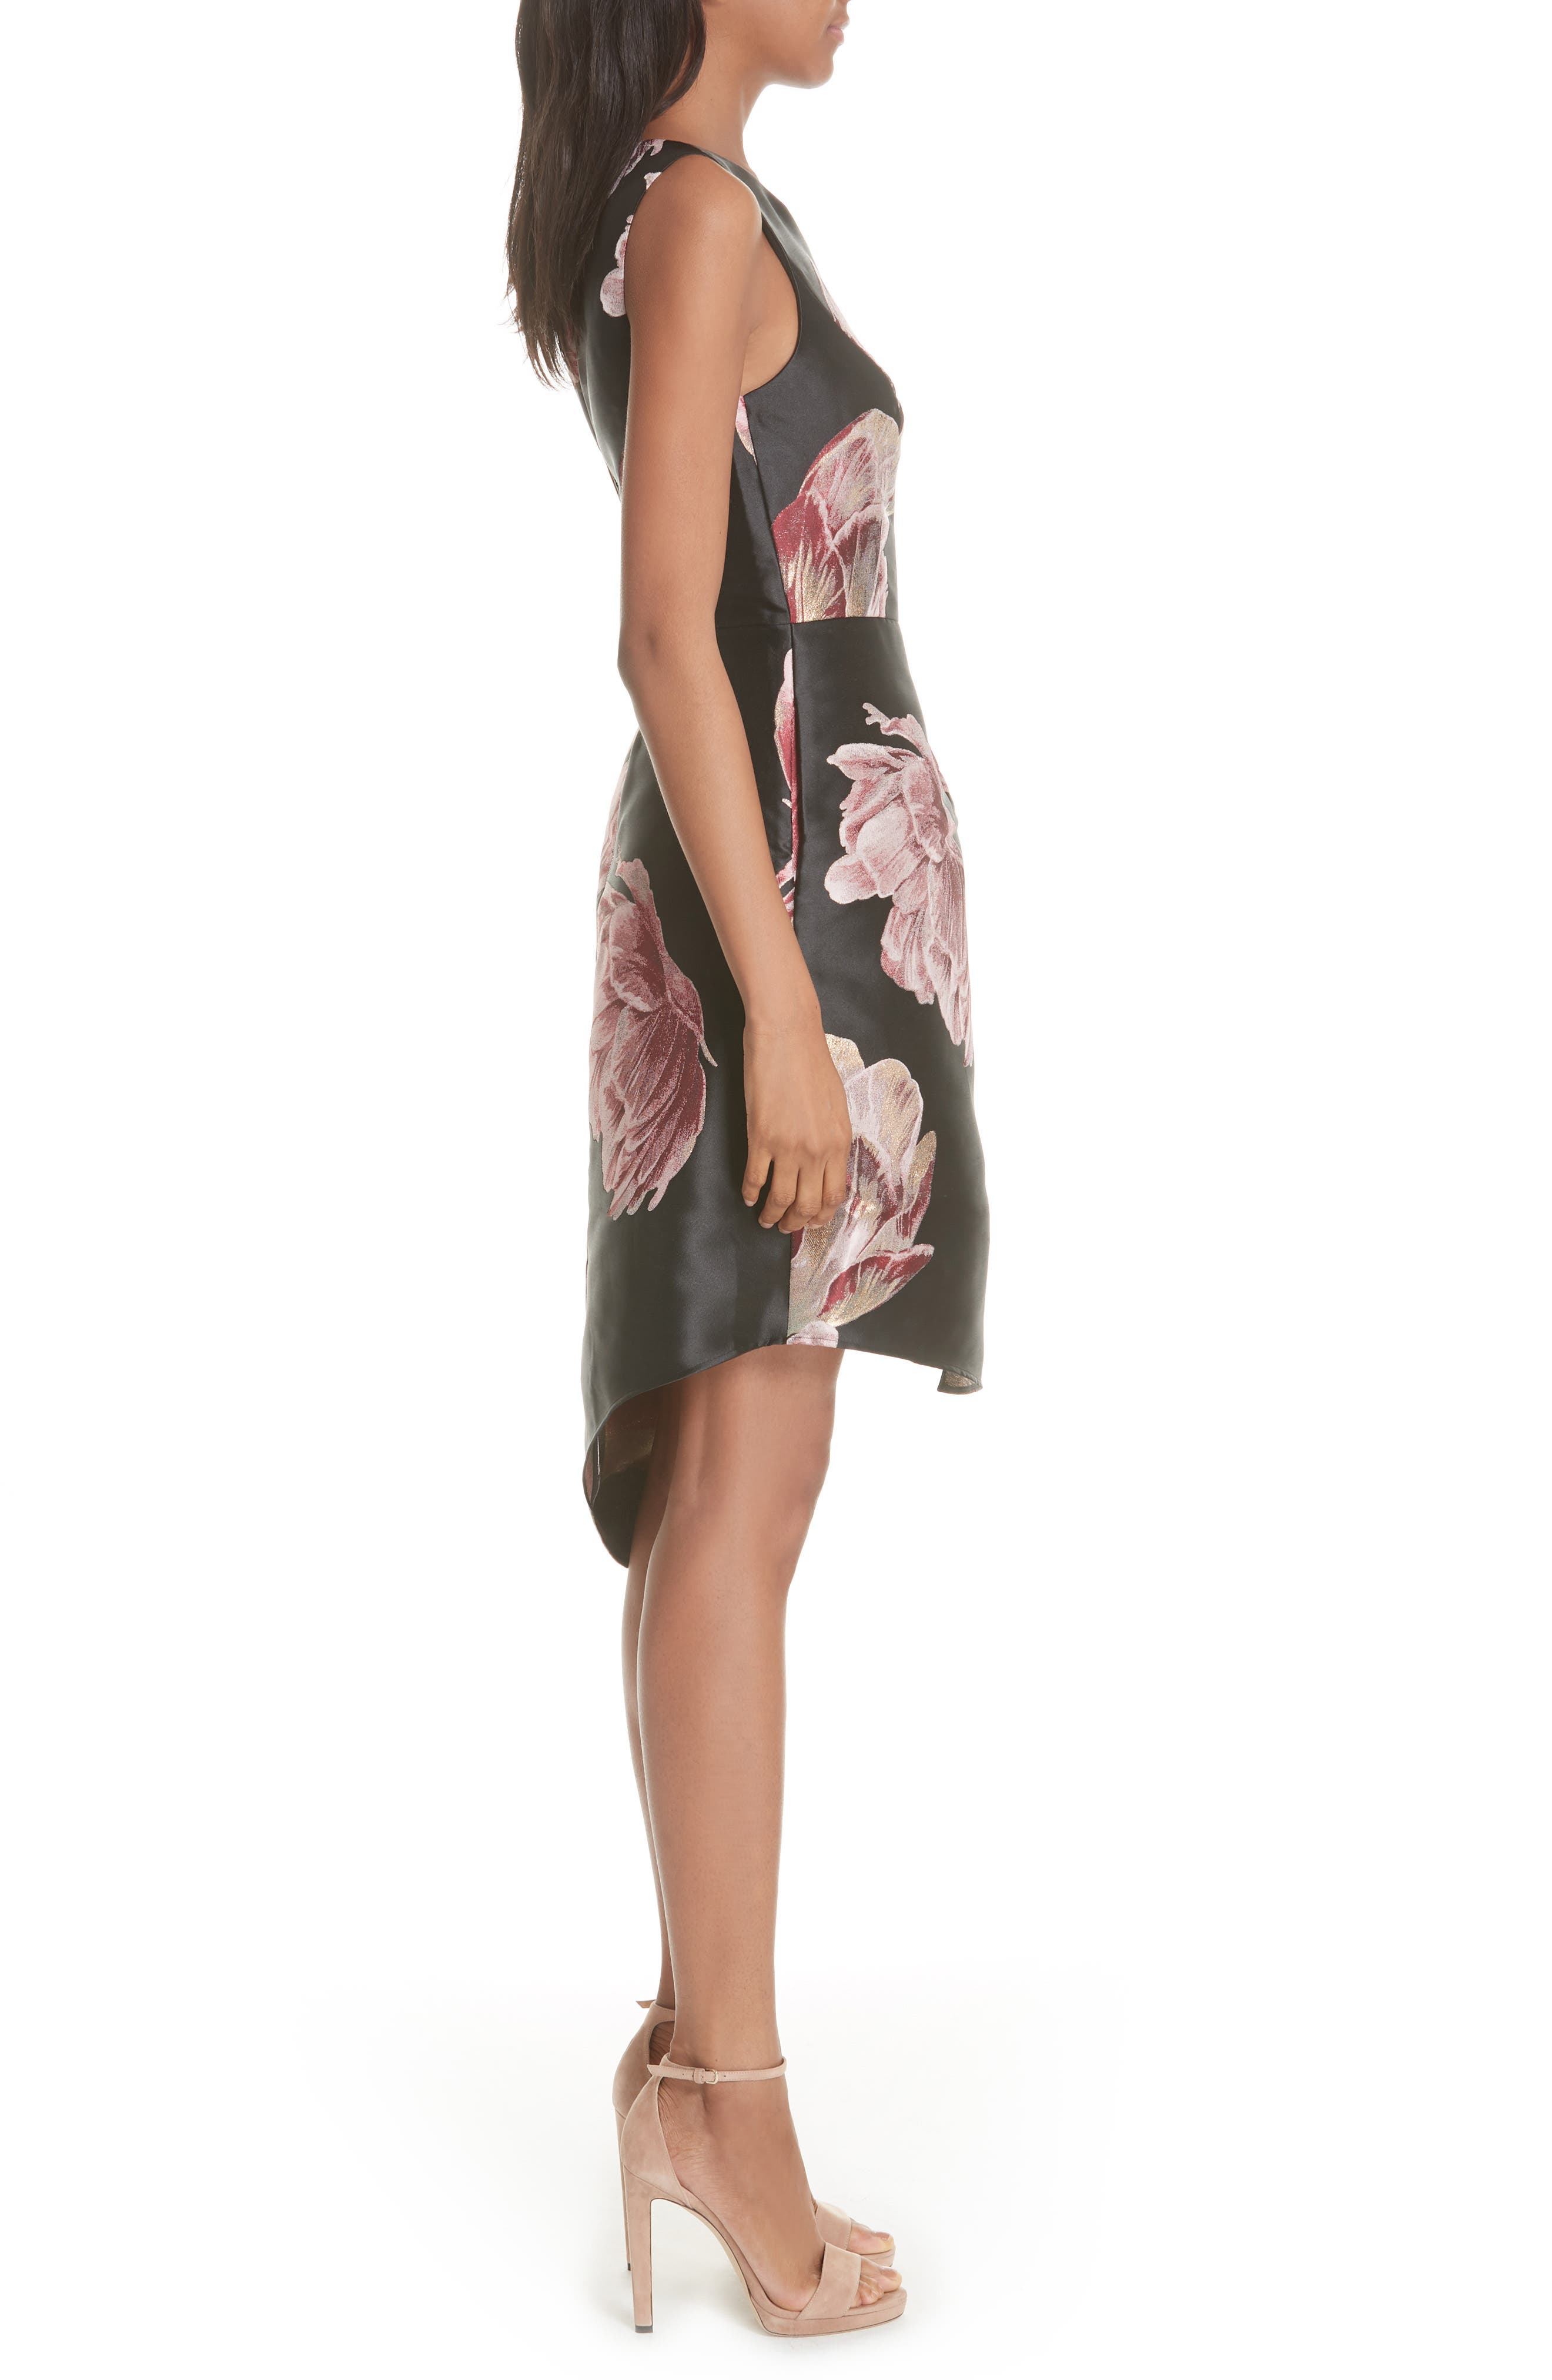 Eyvii Bay of Honour Asymmetrical Dress,                             Alternate thumbnail 3, color,                             Black